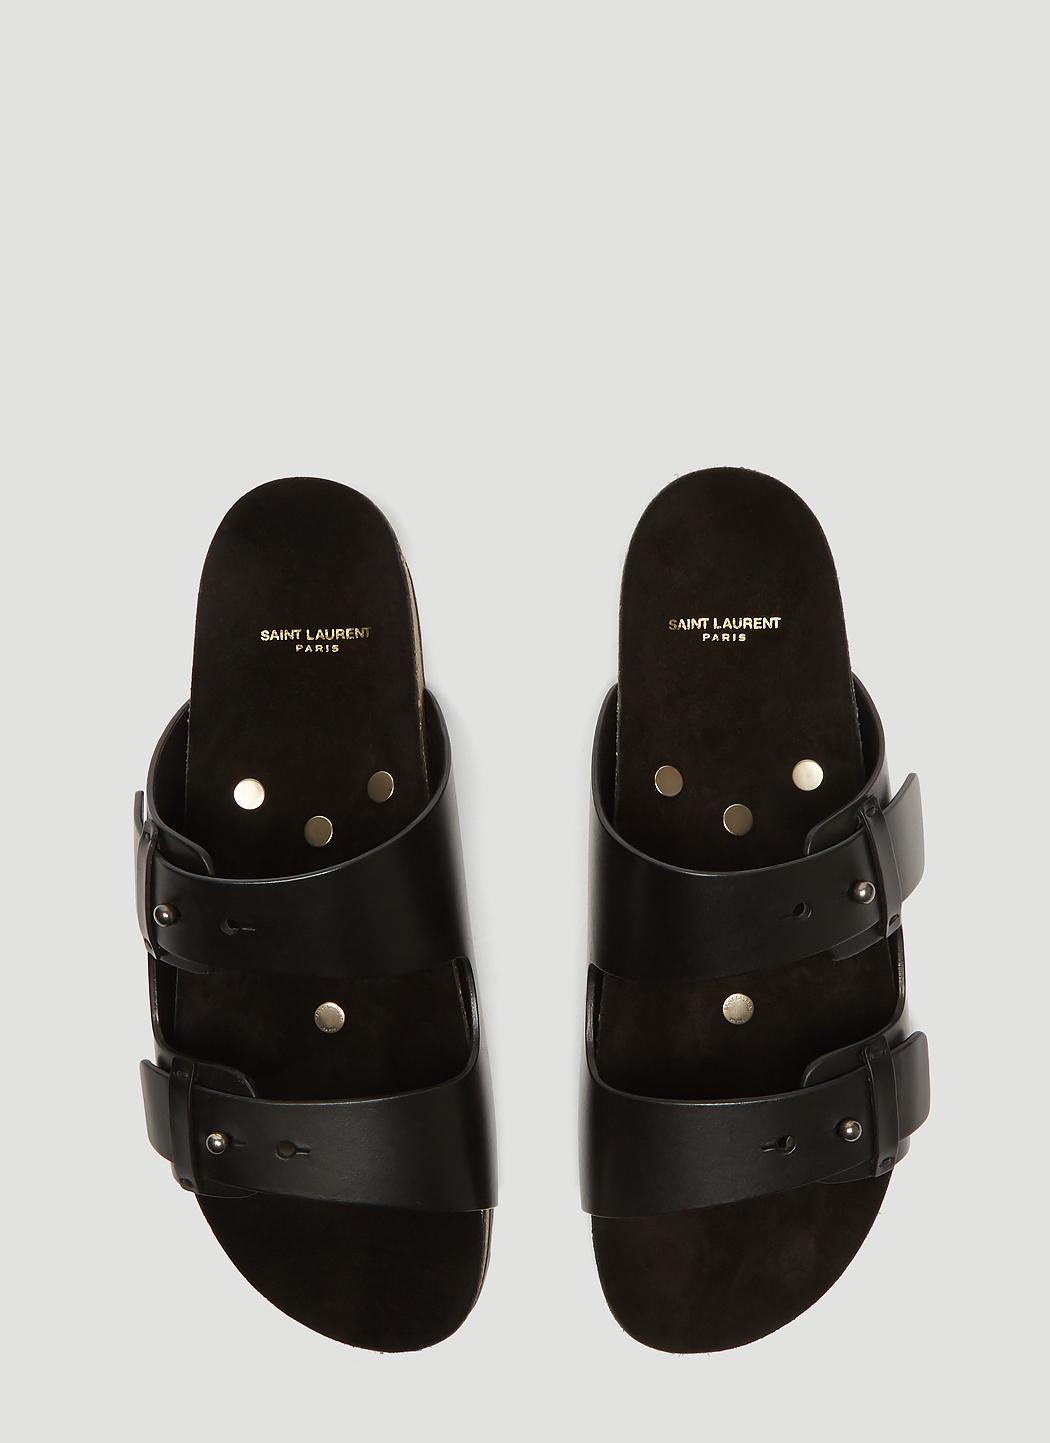 298d2b129436 Saint Laurent - Black Jimmy Sandal With Leather Strap for Men - Lyst. View  fullscreen